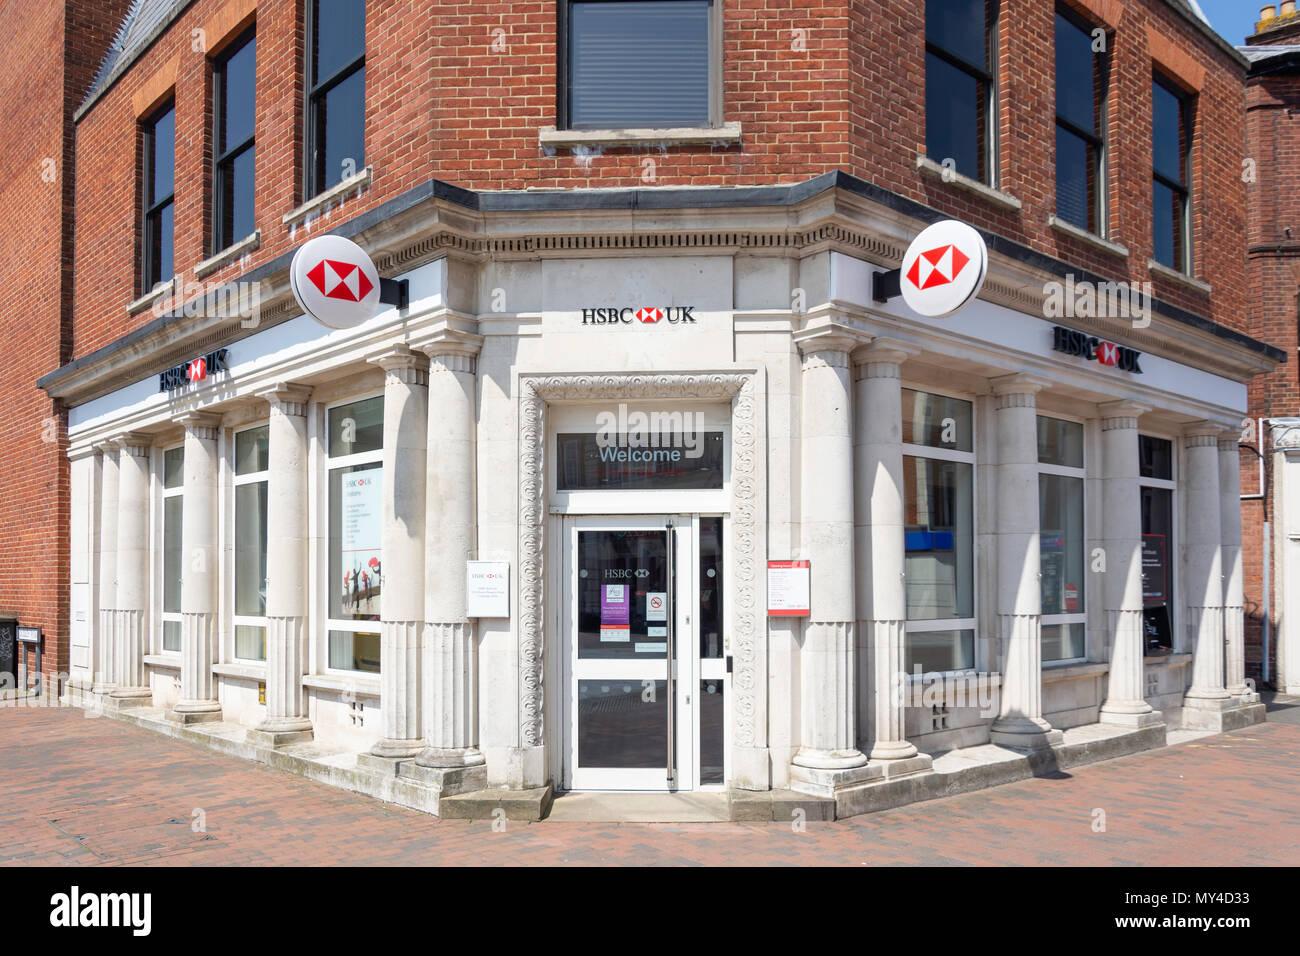 HSBC Bank, Mount Pleasant Road, Royal Tunbridge Wells, Kent, England, United Kingdom - Stock Image